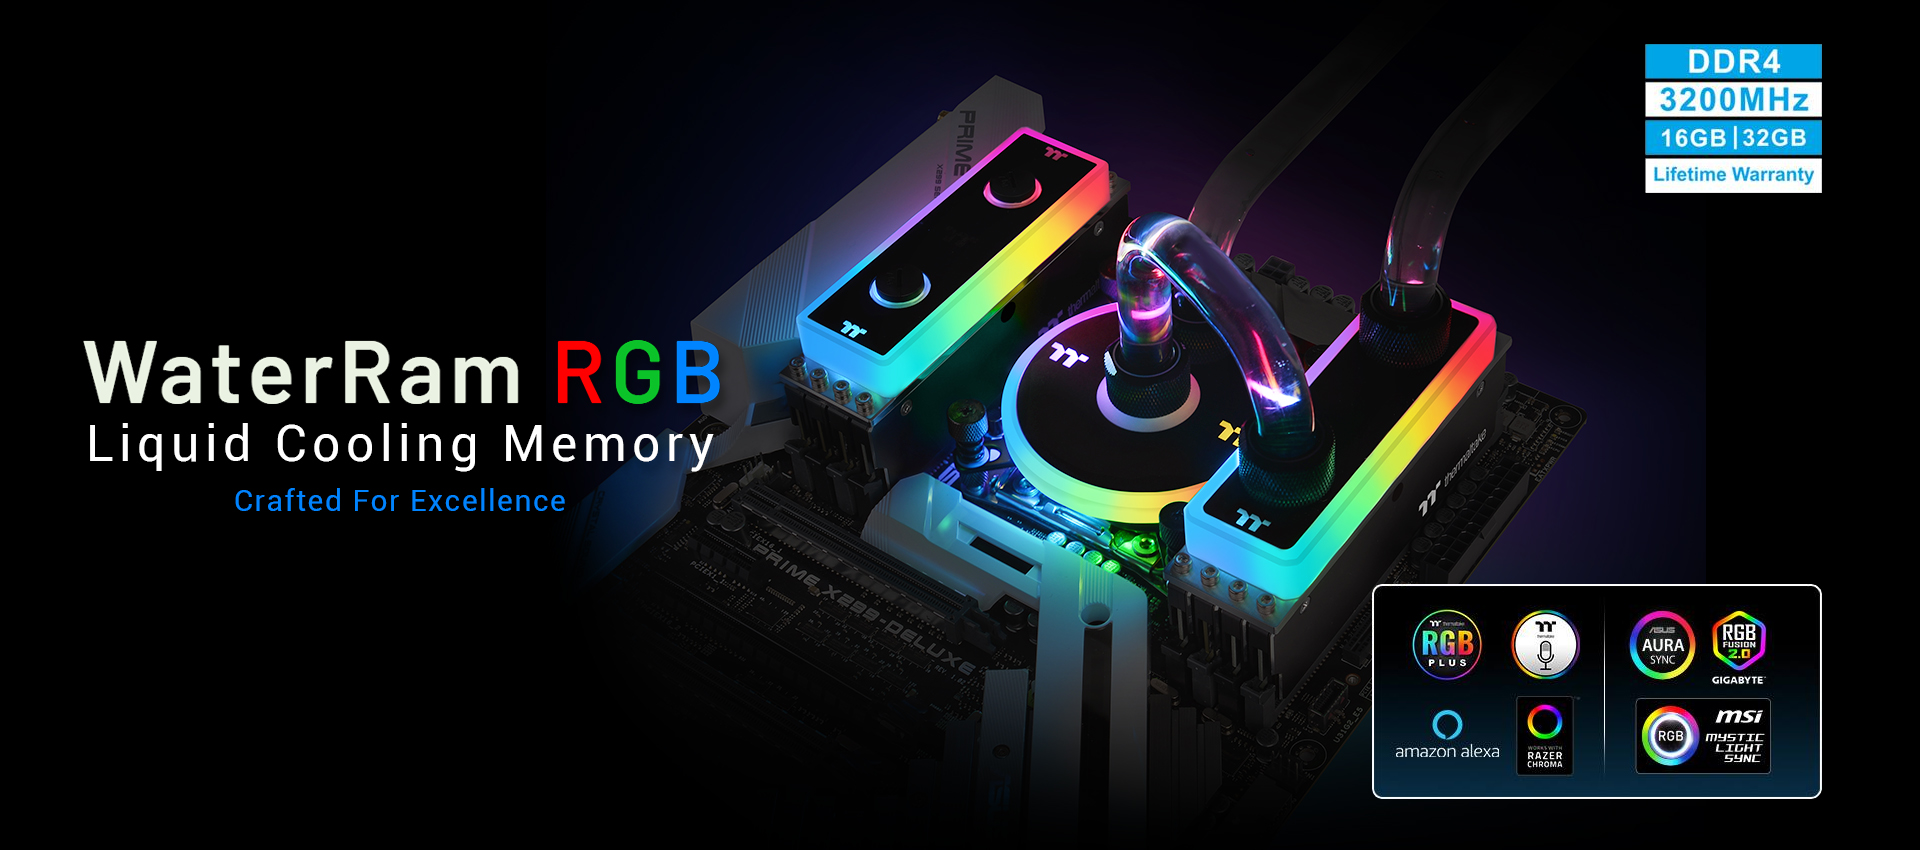 WaterRam RGB Liquid Cooling Memory